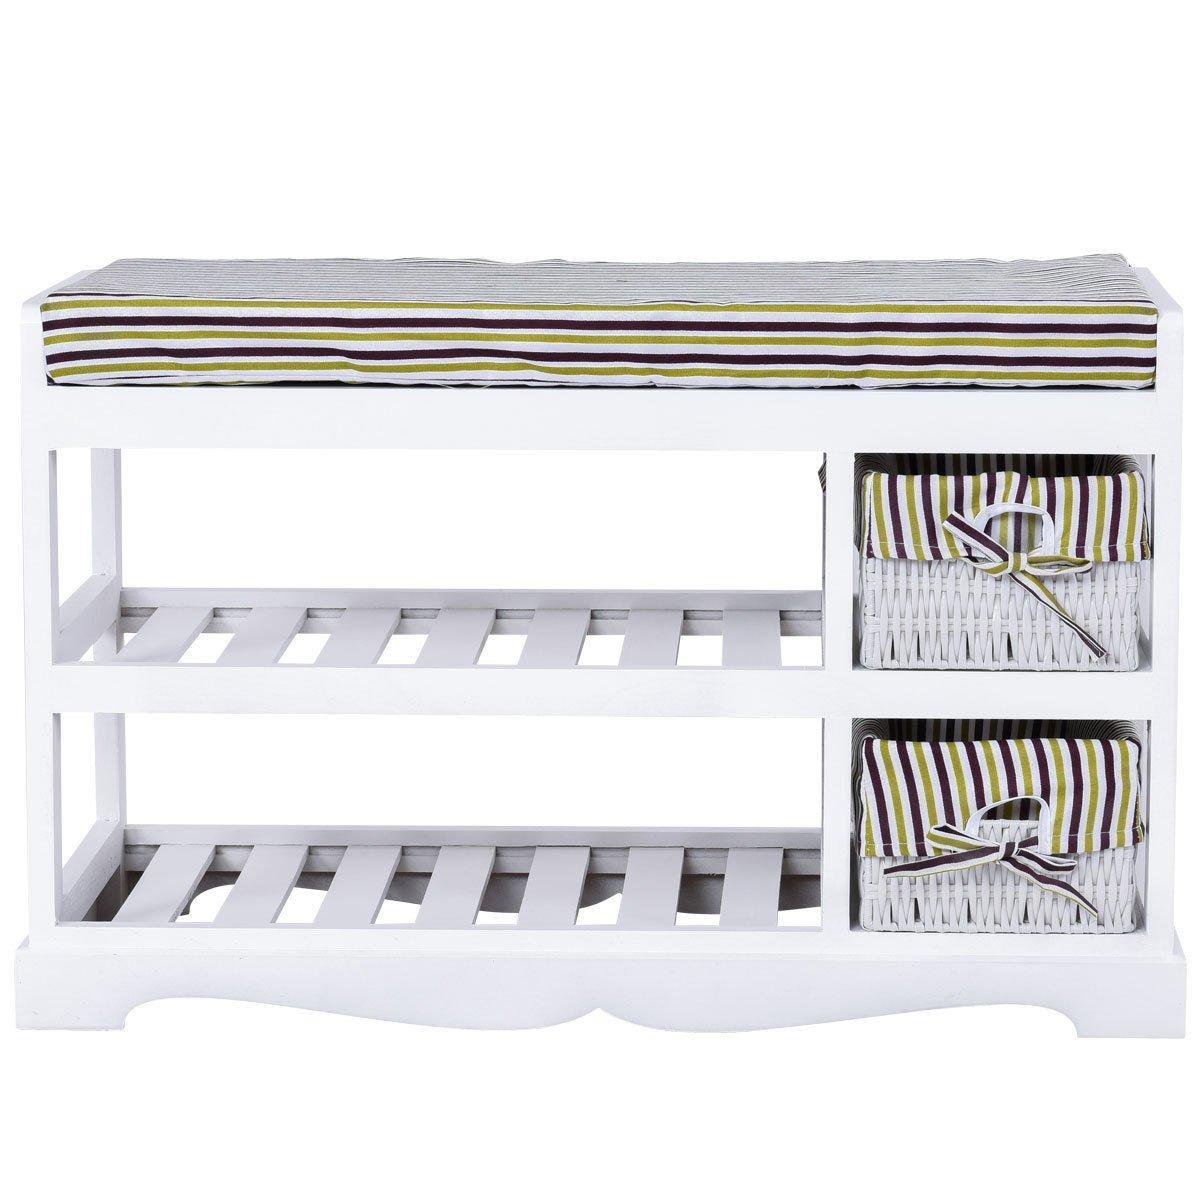 GJH One Padded Shoe Storage Bench Organizer Rack Shelf Unit Entryway Hallway Bench White 2 Basket 28